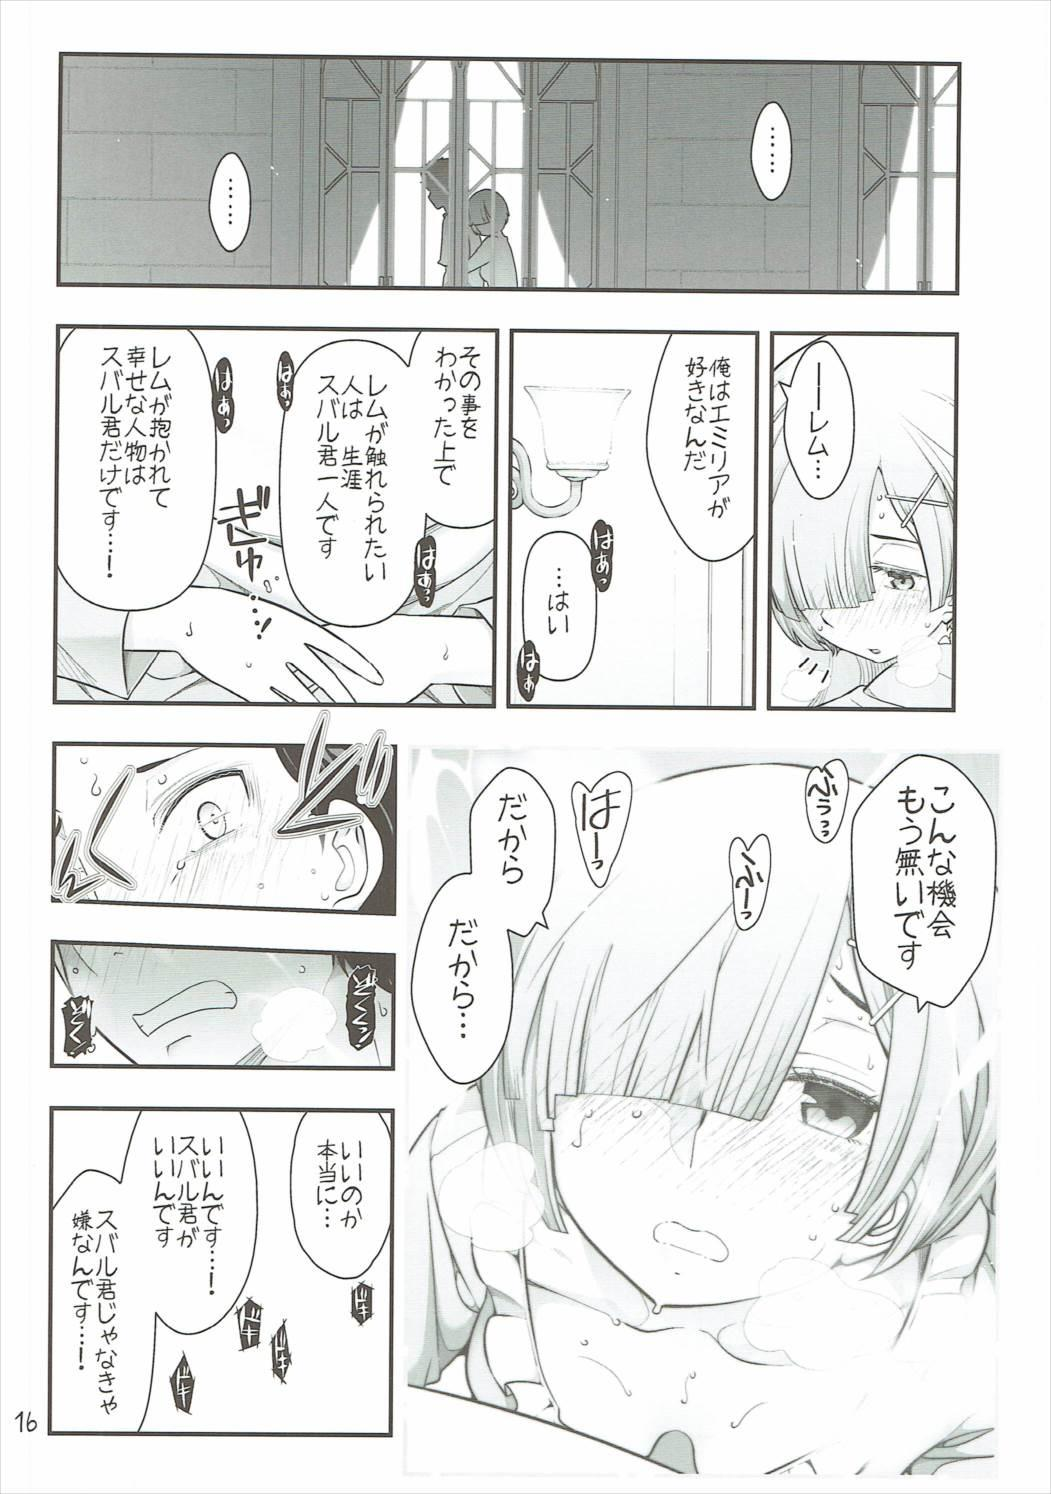 RMH Rem-san maji ecchi 16